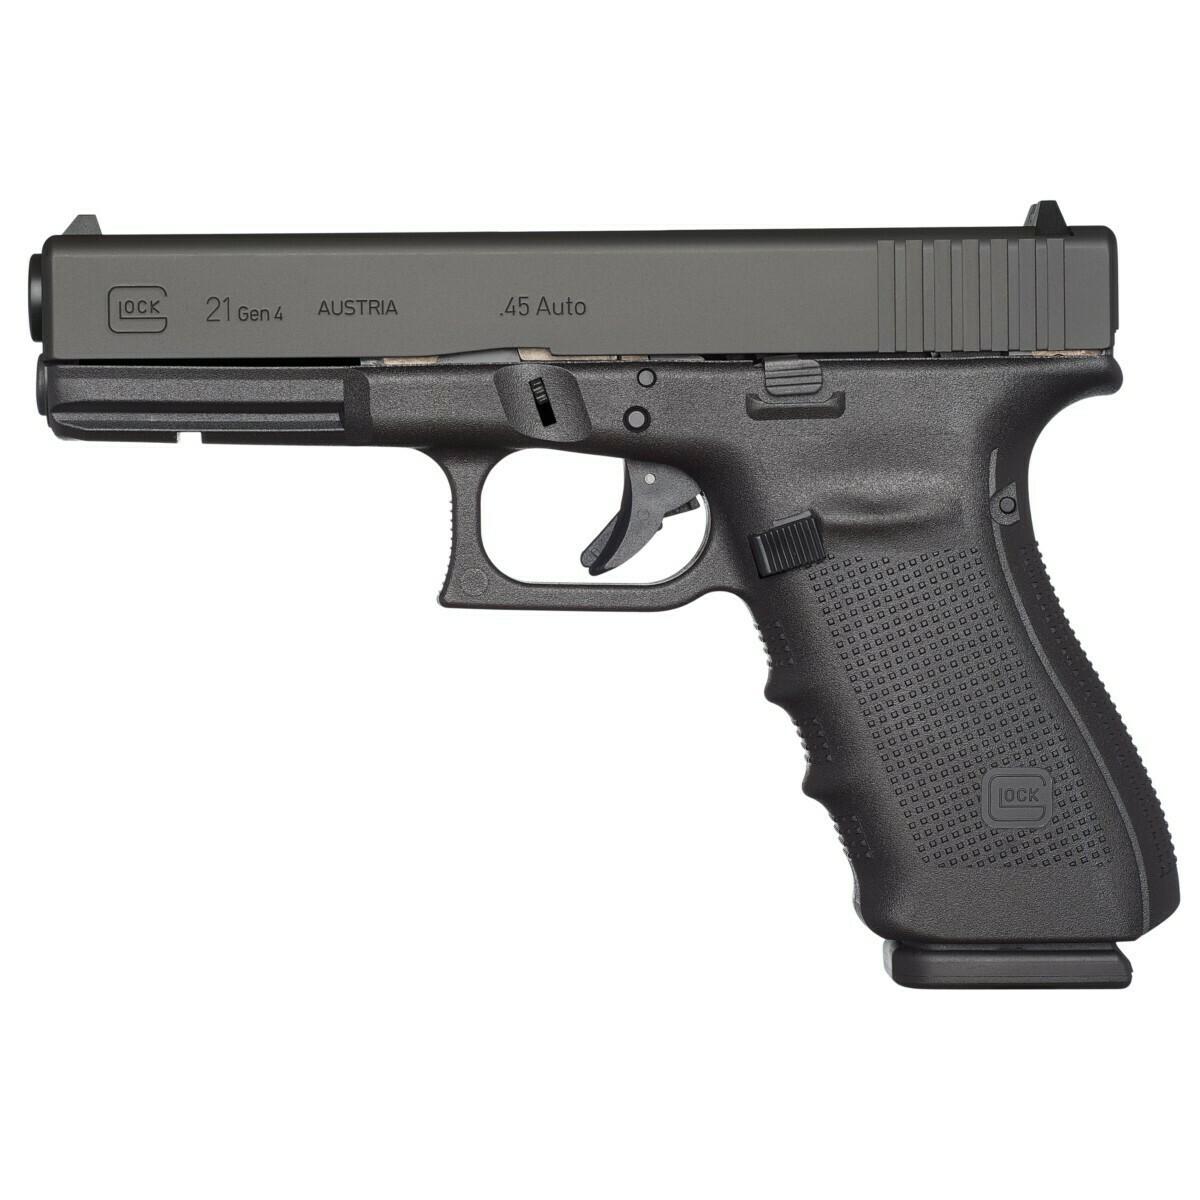 Glock 21 Gen 4 .45ACP 13rd Mags